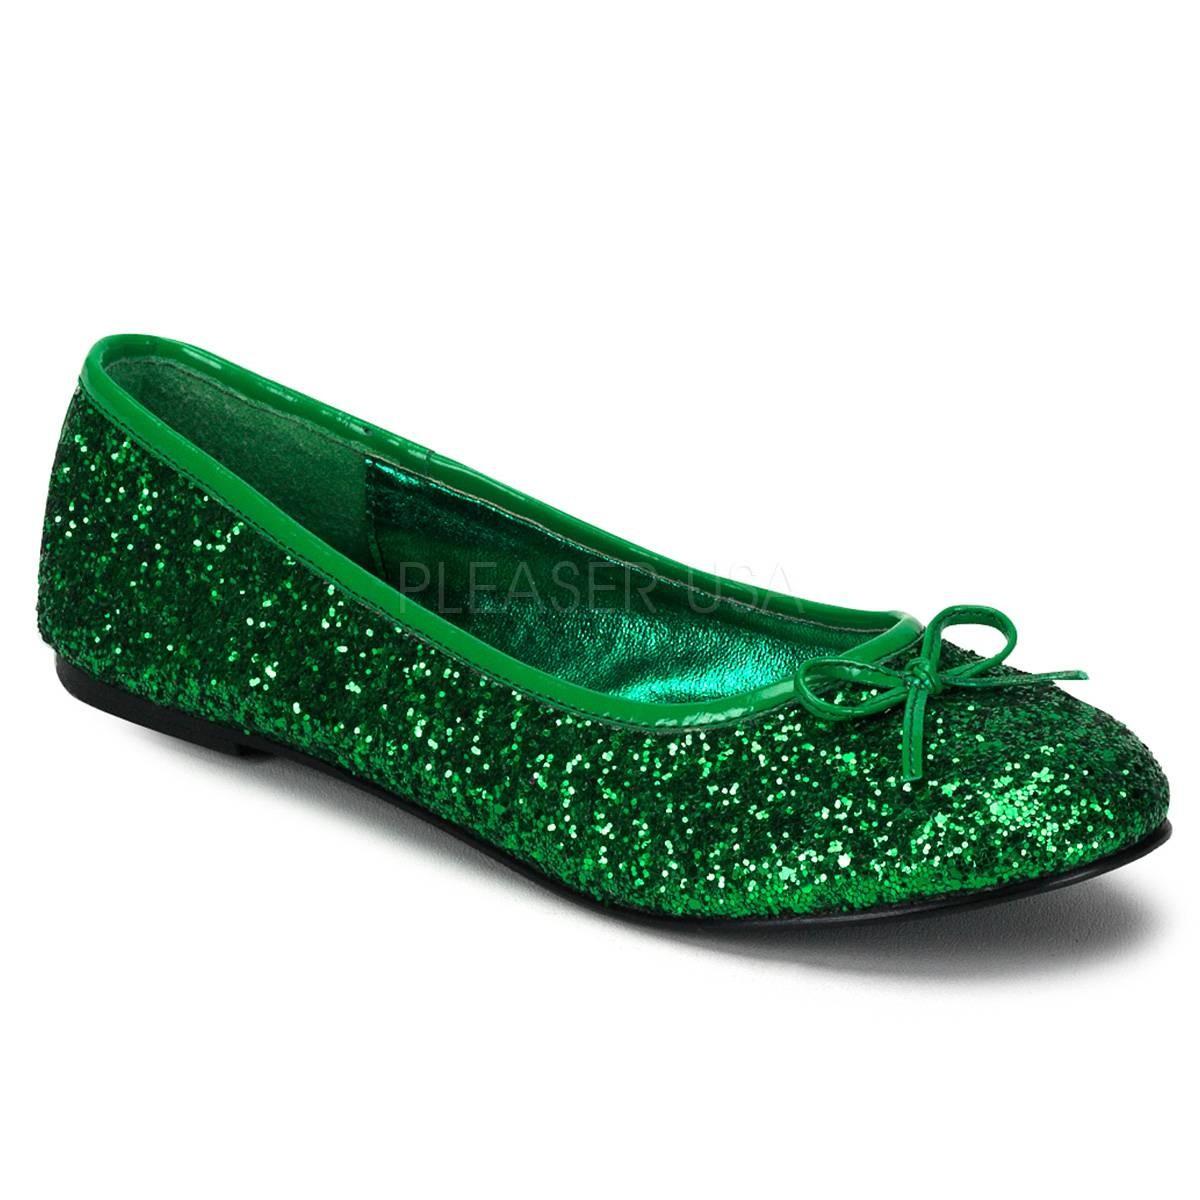 Ballerinas - STAR 16G ° Damen Ballerina ° Grün Glitter ° Funtasma  - Onlineshop RedSixty